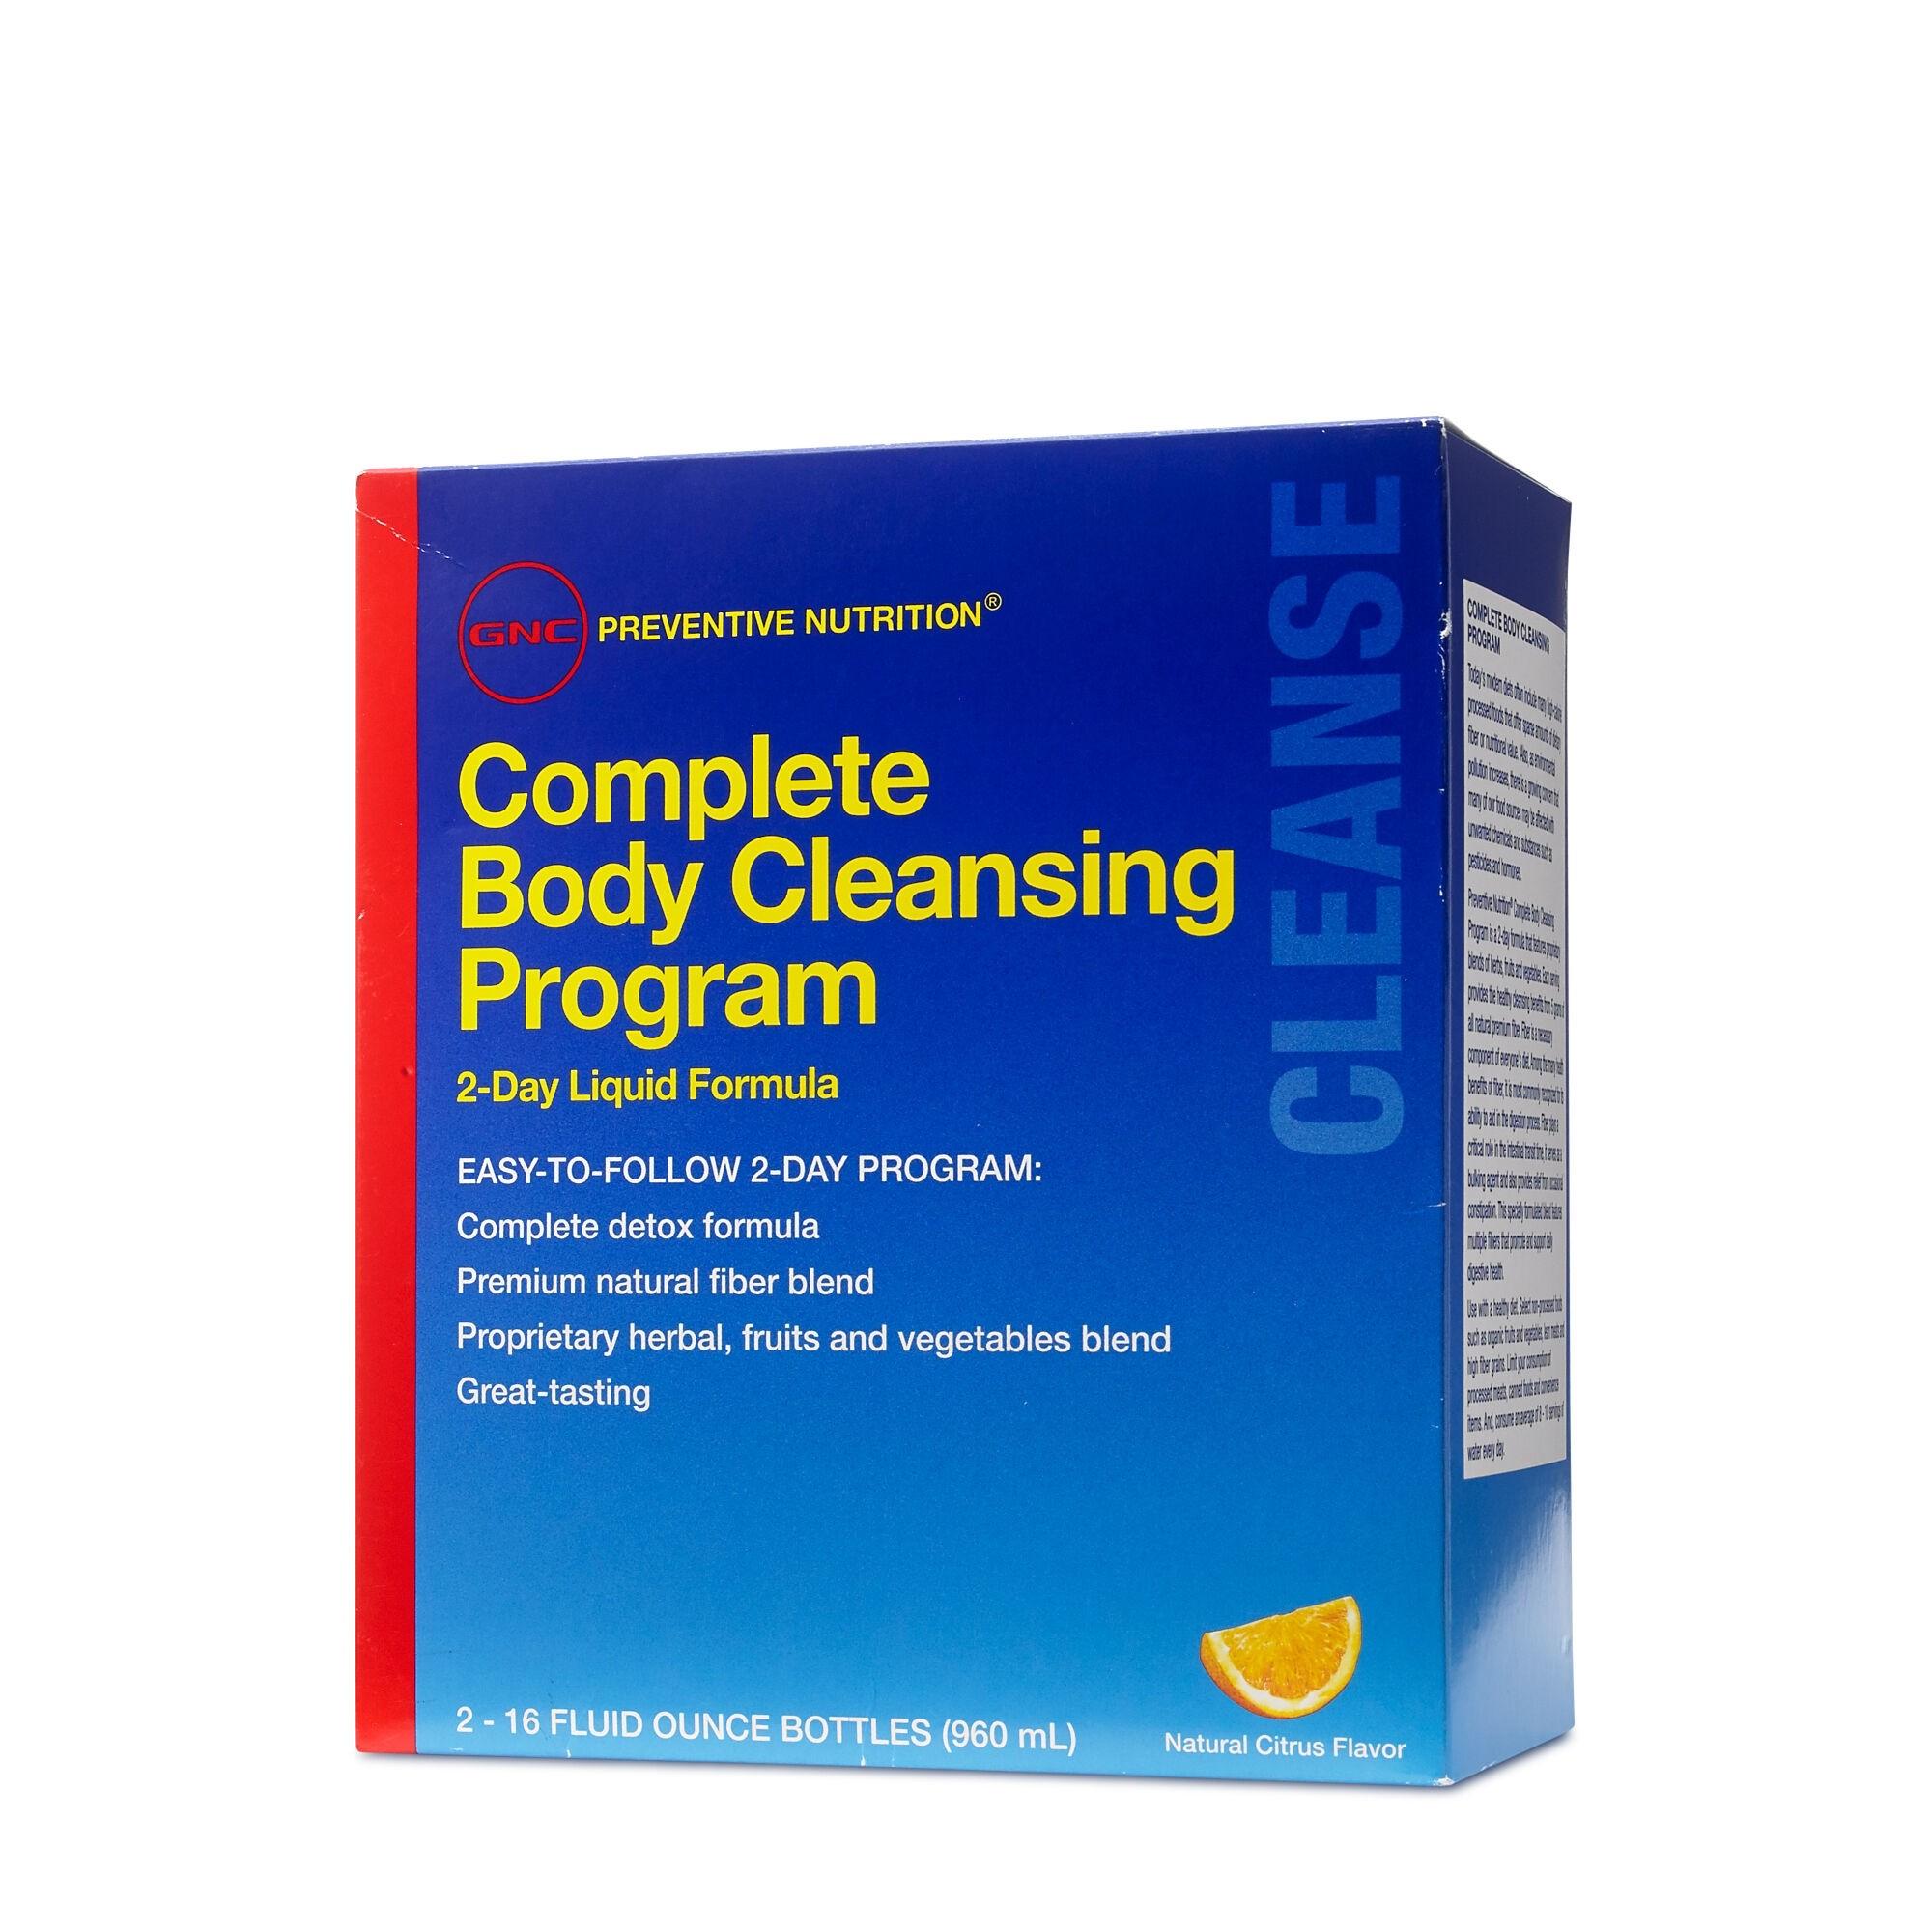 GNC Preventive Nutrition® Complete Body Cleansing Program, Program de Curatare Completa in 2 Zile, cu Aroma de Citrice, 960 ml